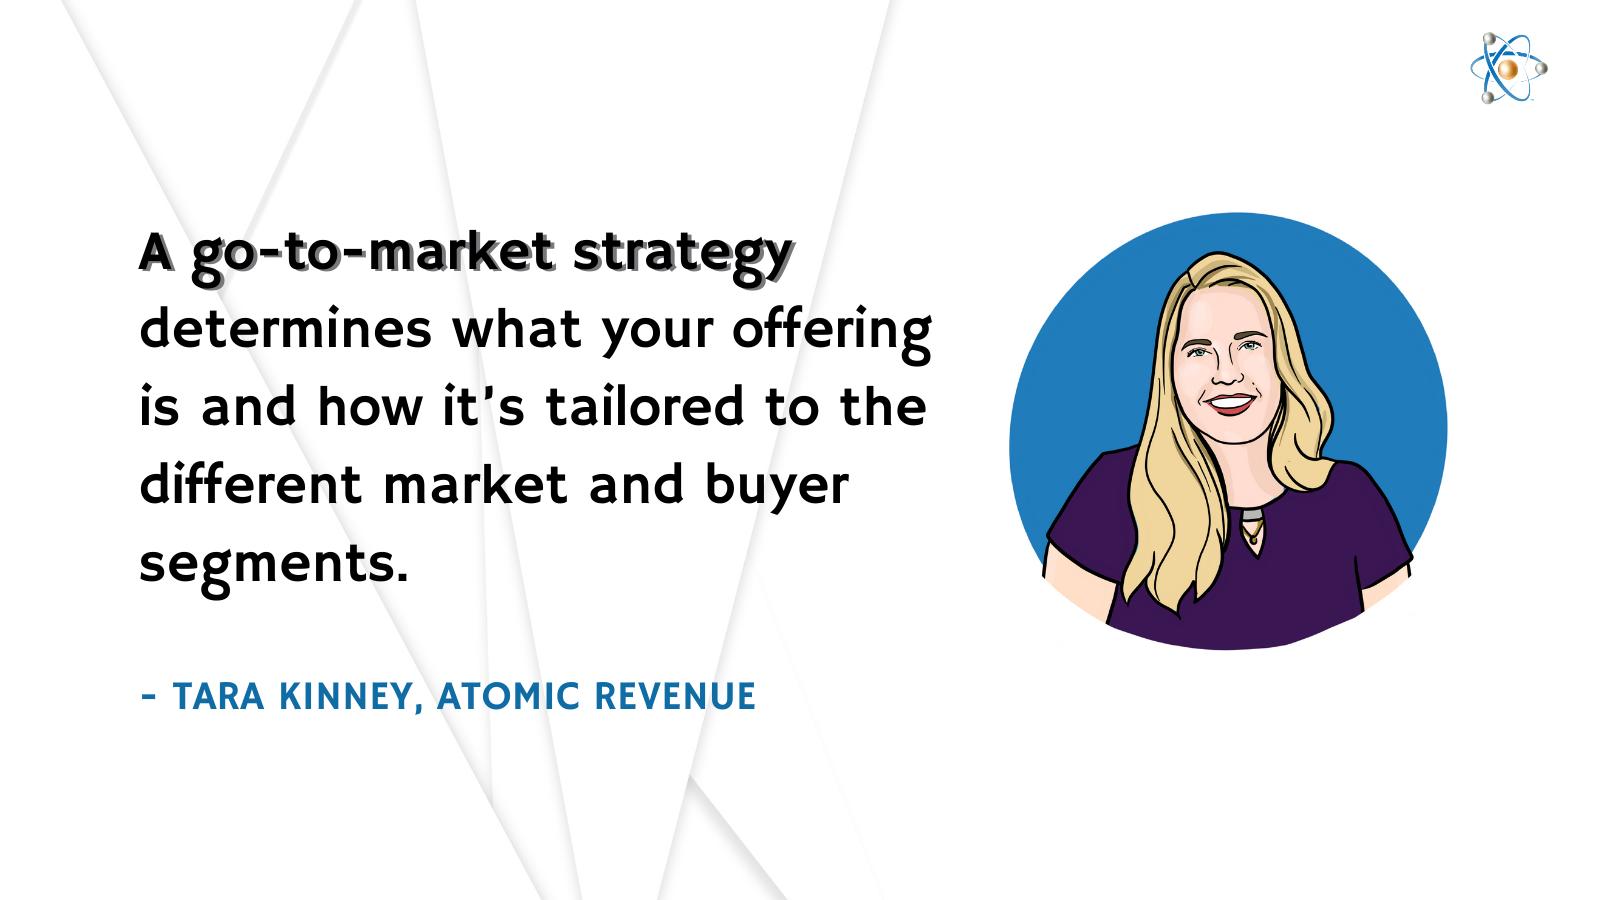 go to market strategy offering tailored different markets buyer segments tara kinney atomic revenue